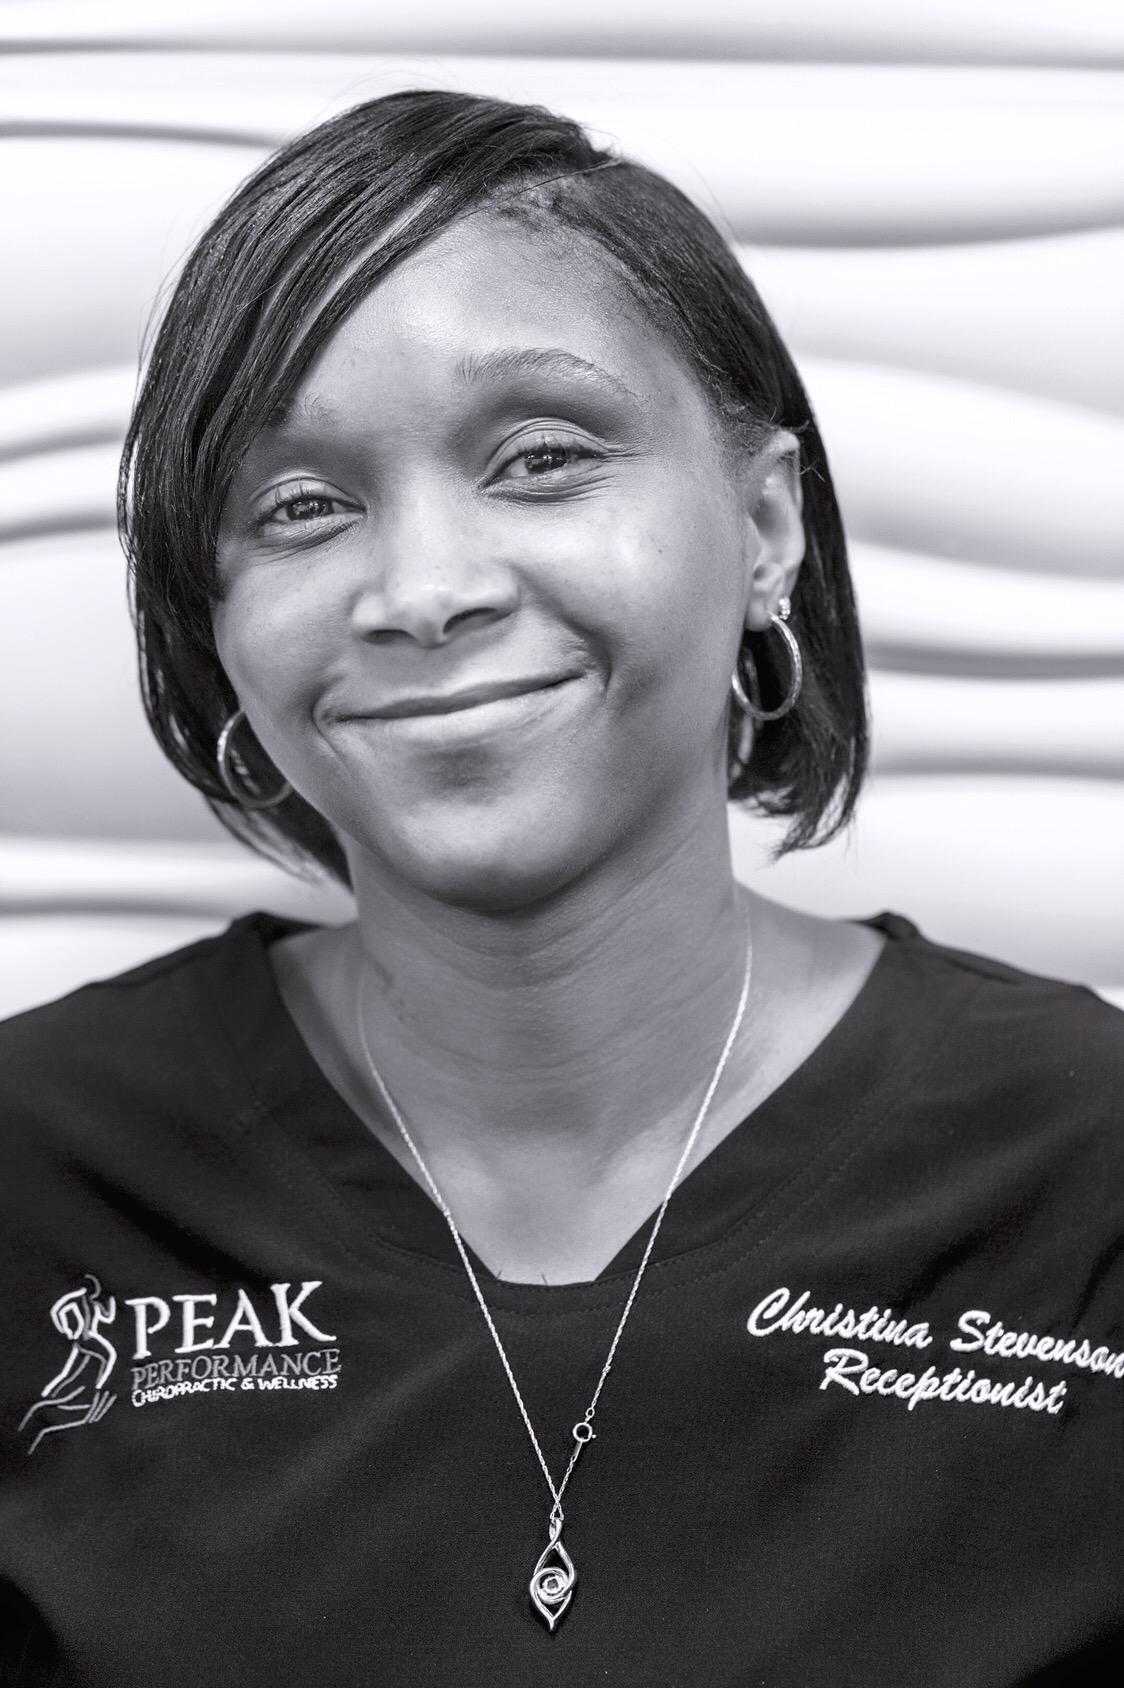 Peak Performance Chiropractic - Christina Stevenson